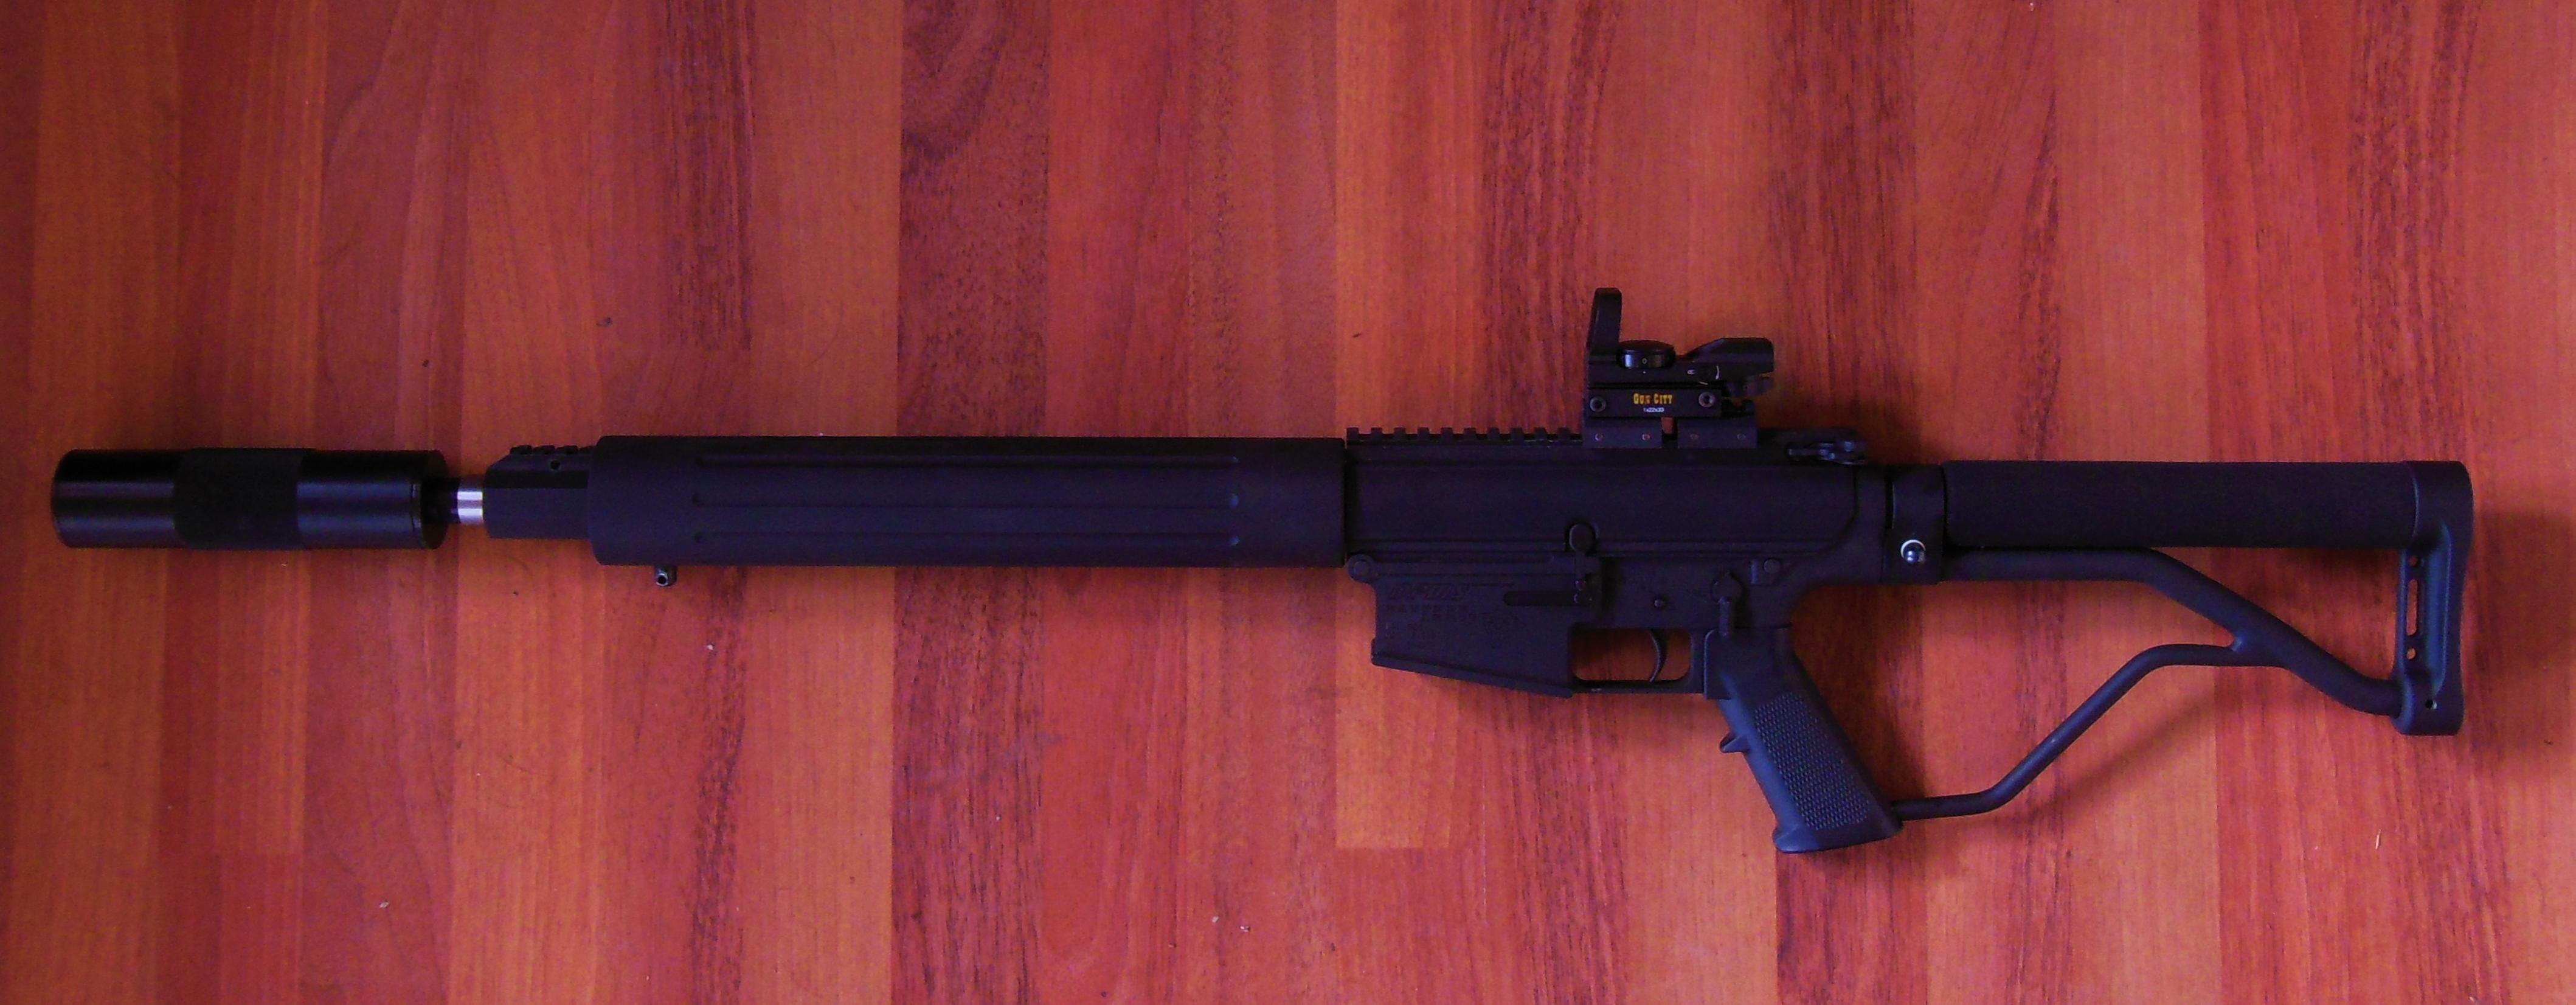 Name:  AR-10.jpg Views: 1011 Size:  500.3 KB